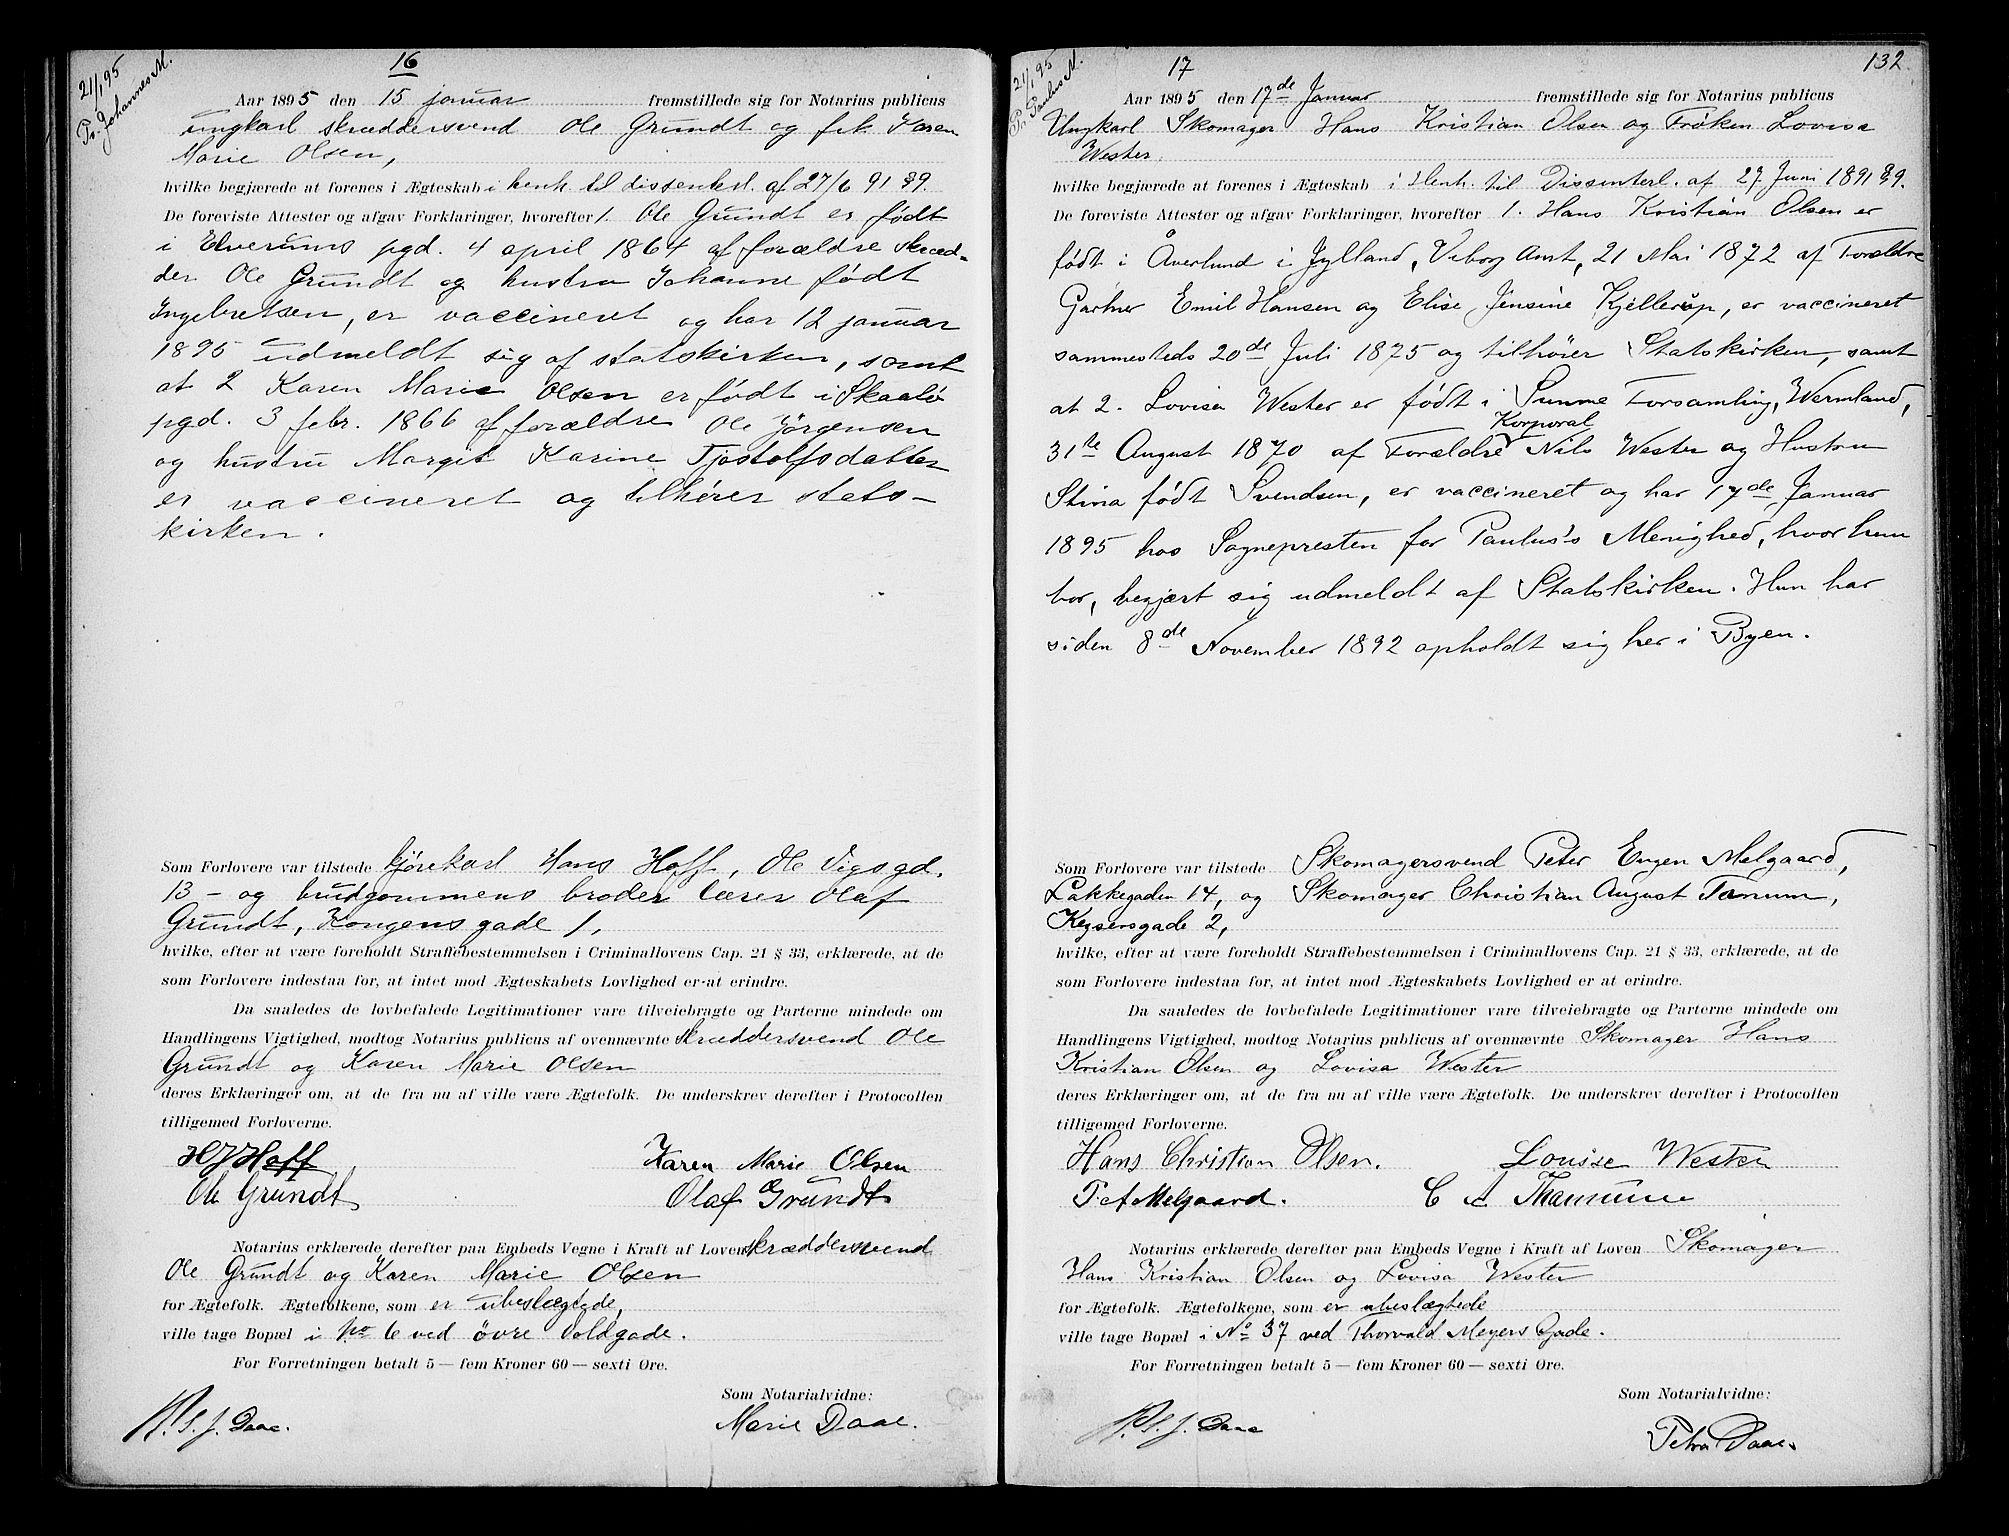 SAO, Oslo byfogd avd. I, L/Lb/Lbb/L0003: Notarialprotokoll, rekke II: Vigsler, 1893-1897, s. 131b-132a